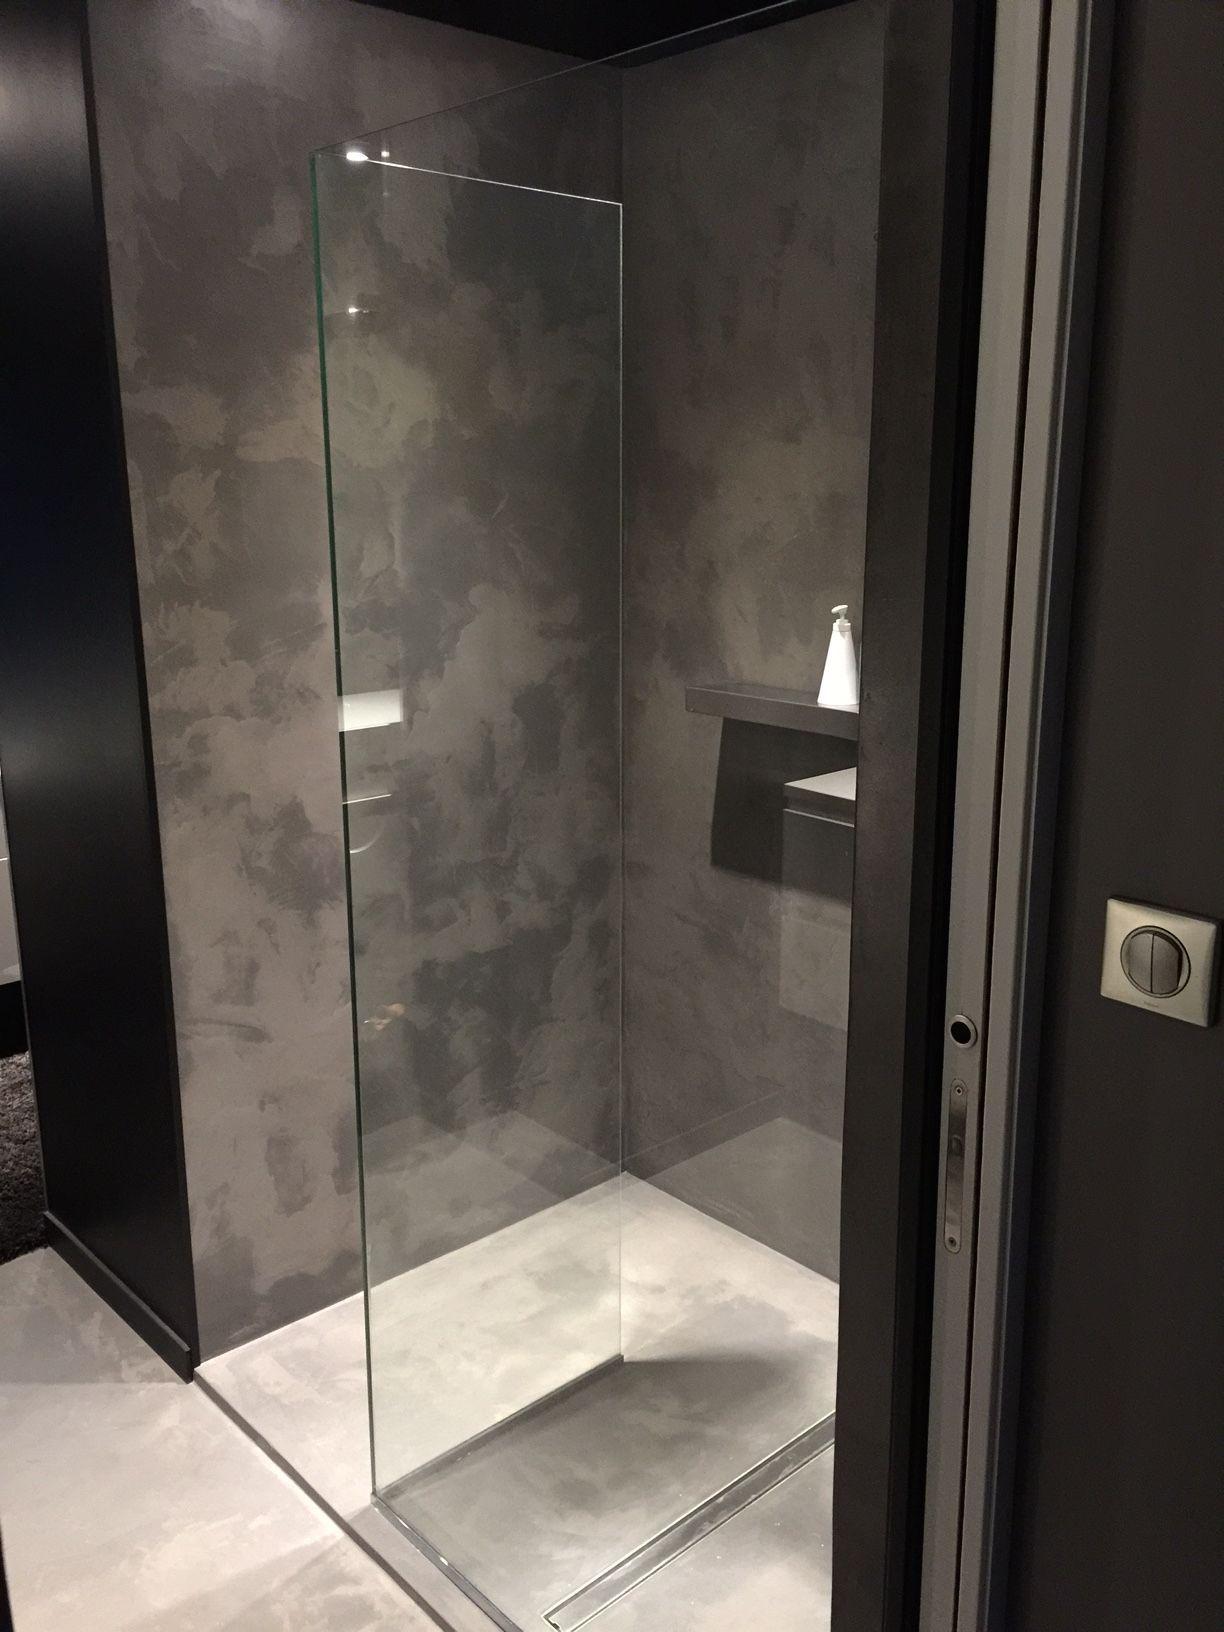 Douche A L Italienne Salle De Bain En Beton Cire Rouen 76 Bathroomcloset Douche En Beton Cire Douche Italienne Design Douche Beton